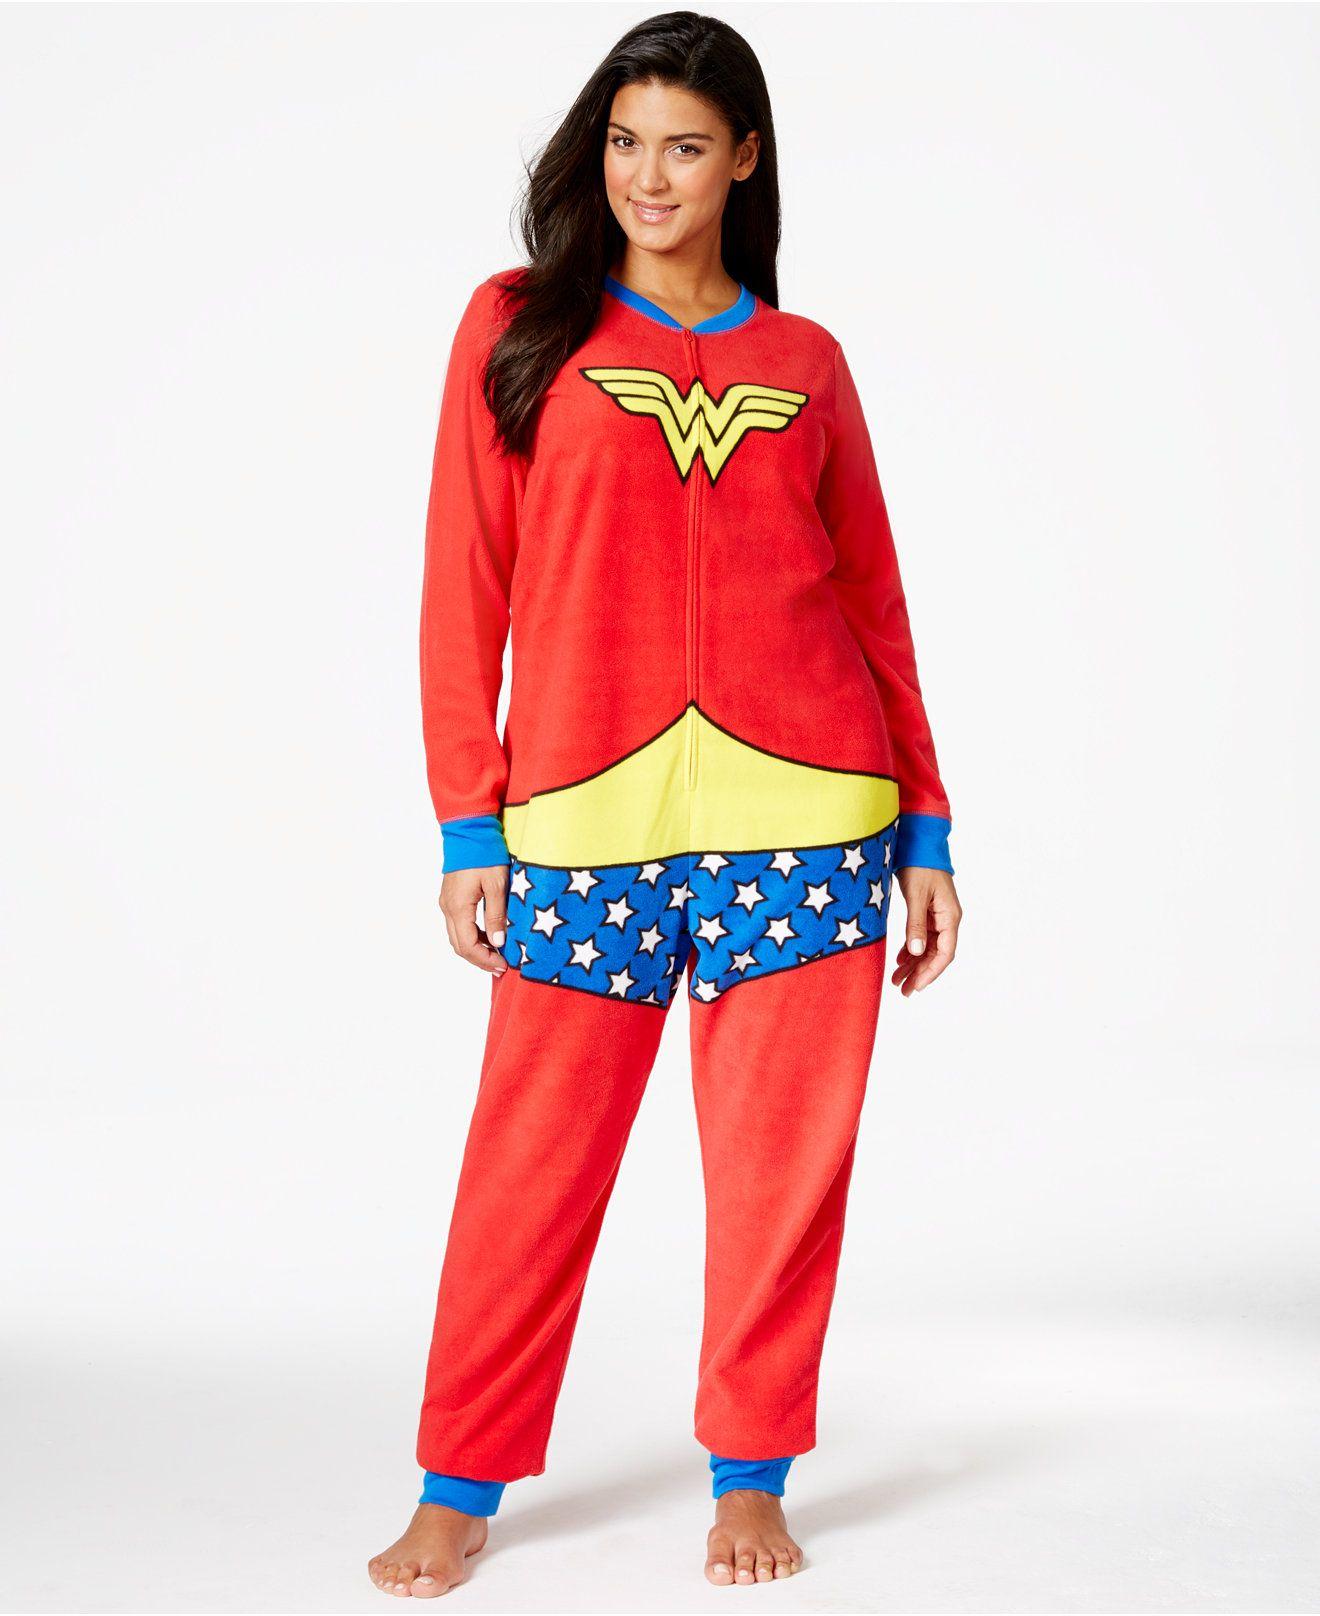 983484f1f523 Wonder Woman Plus Size Adult Onesie - Pajamas   Robes - Plus Sizes ...